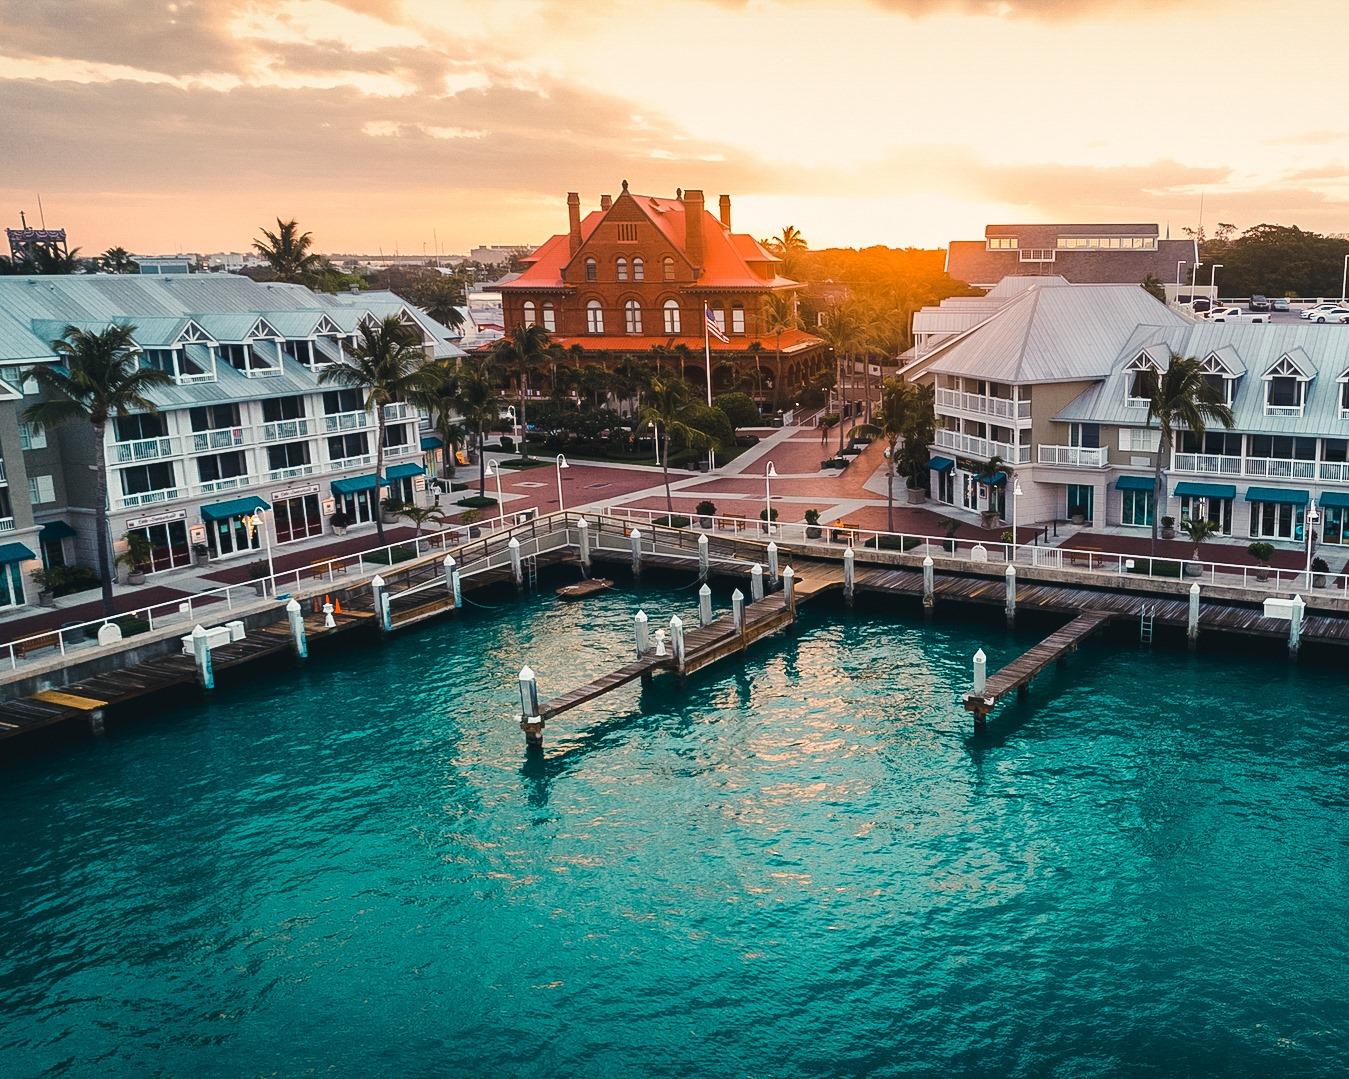 opal key resort florida keys